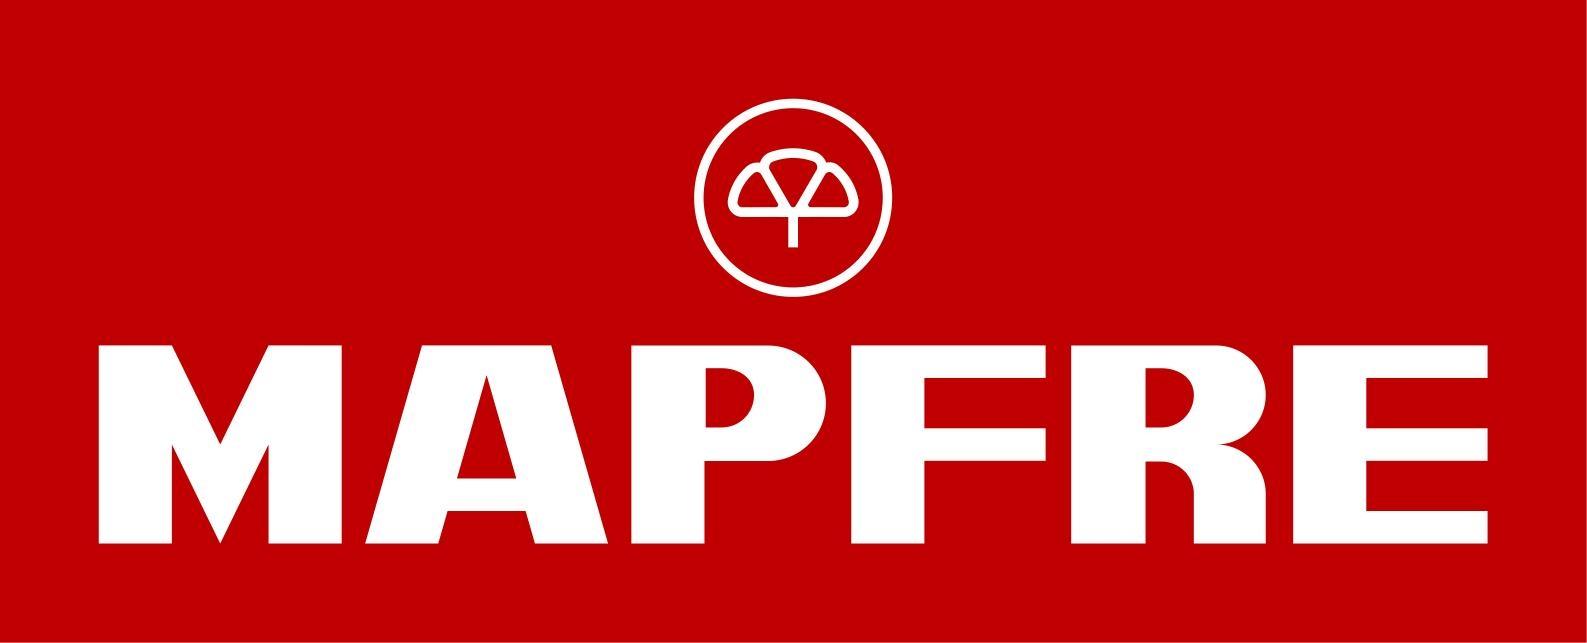 Mapfre Familiar, S.A.